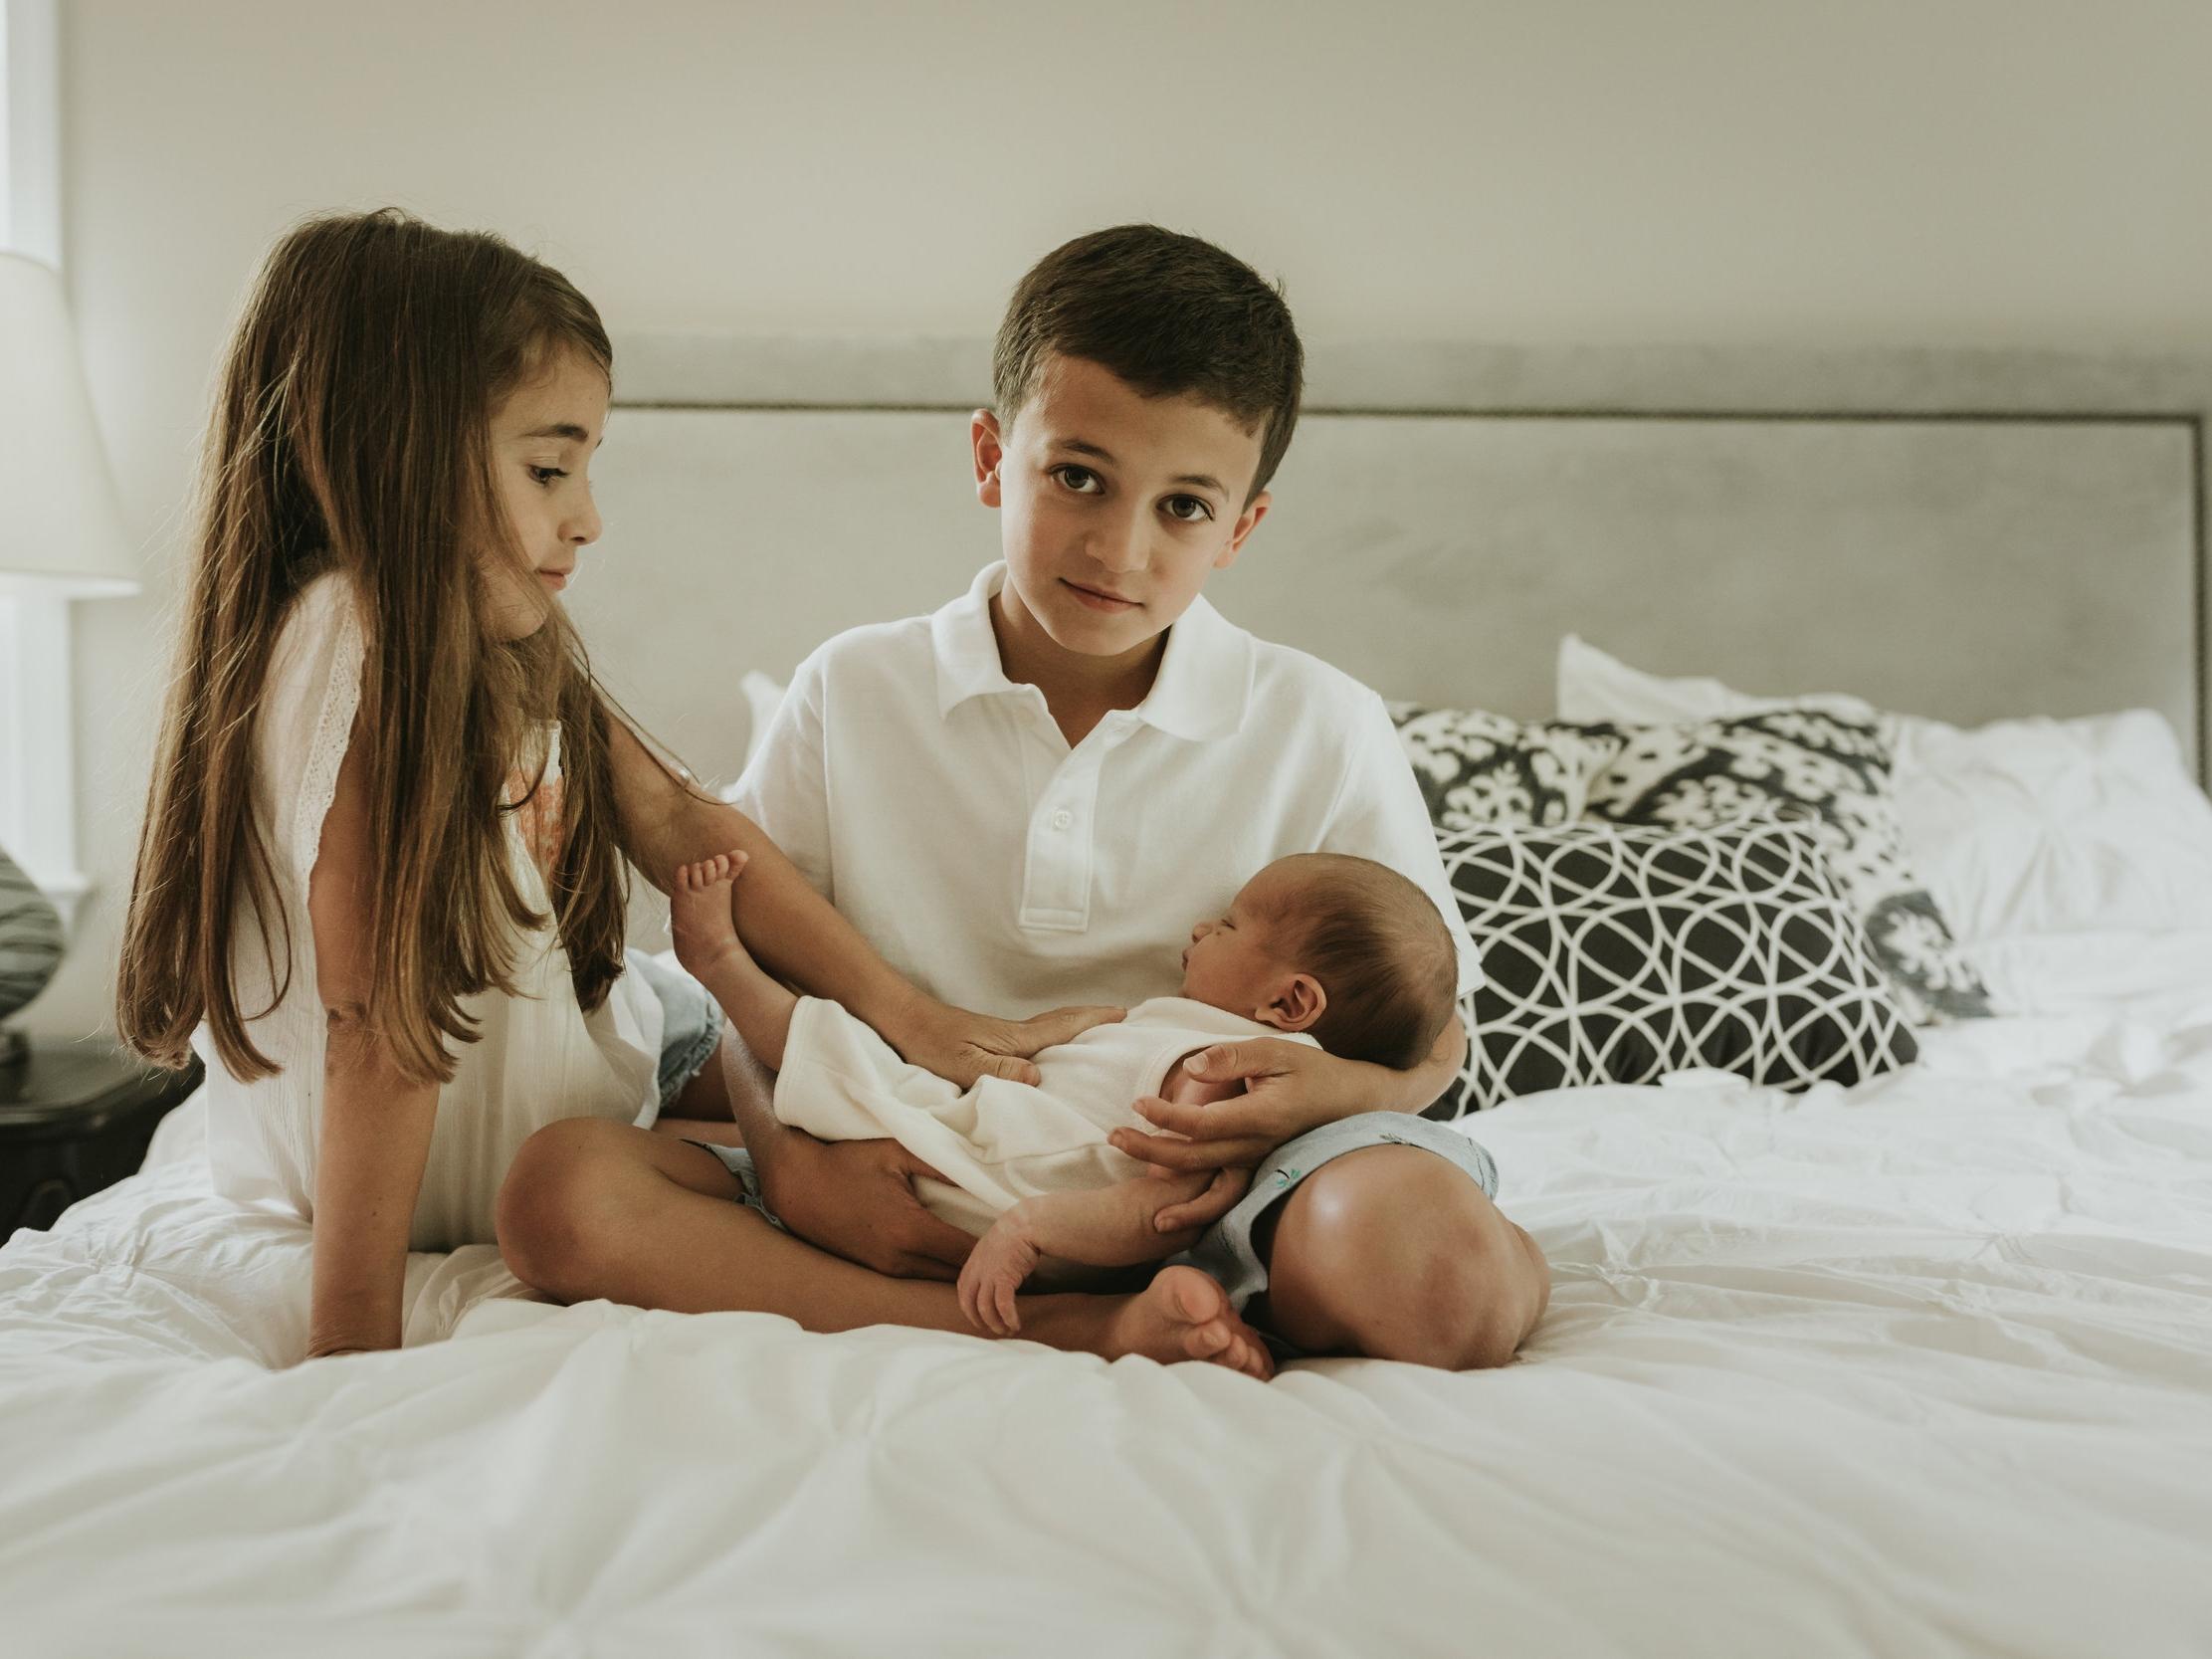 Lifestyle_Family_Newborn_Photography_Potomac_Maryland_Brandi_Markham_09.jpg